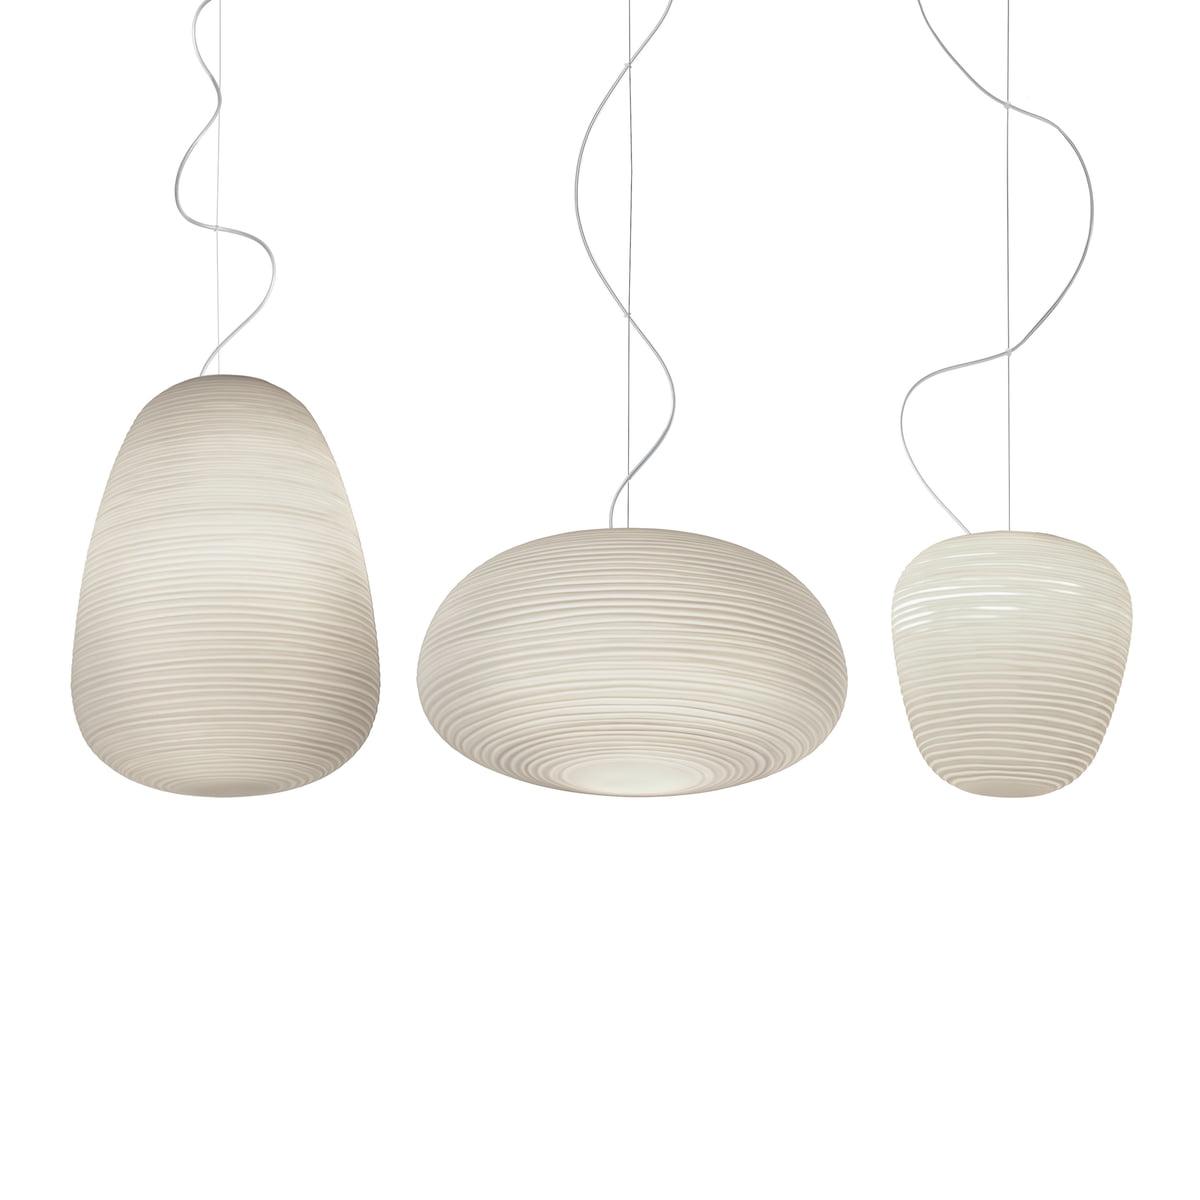 Rituals pendant lamp by foscarini in our shop foscarini rituals pendant luminaires aloadofball Gallery